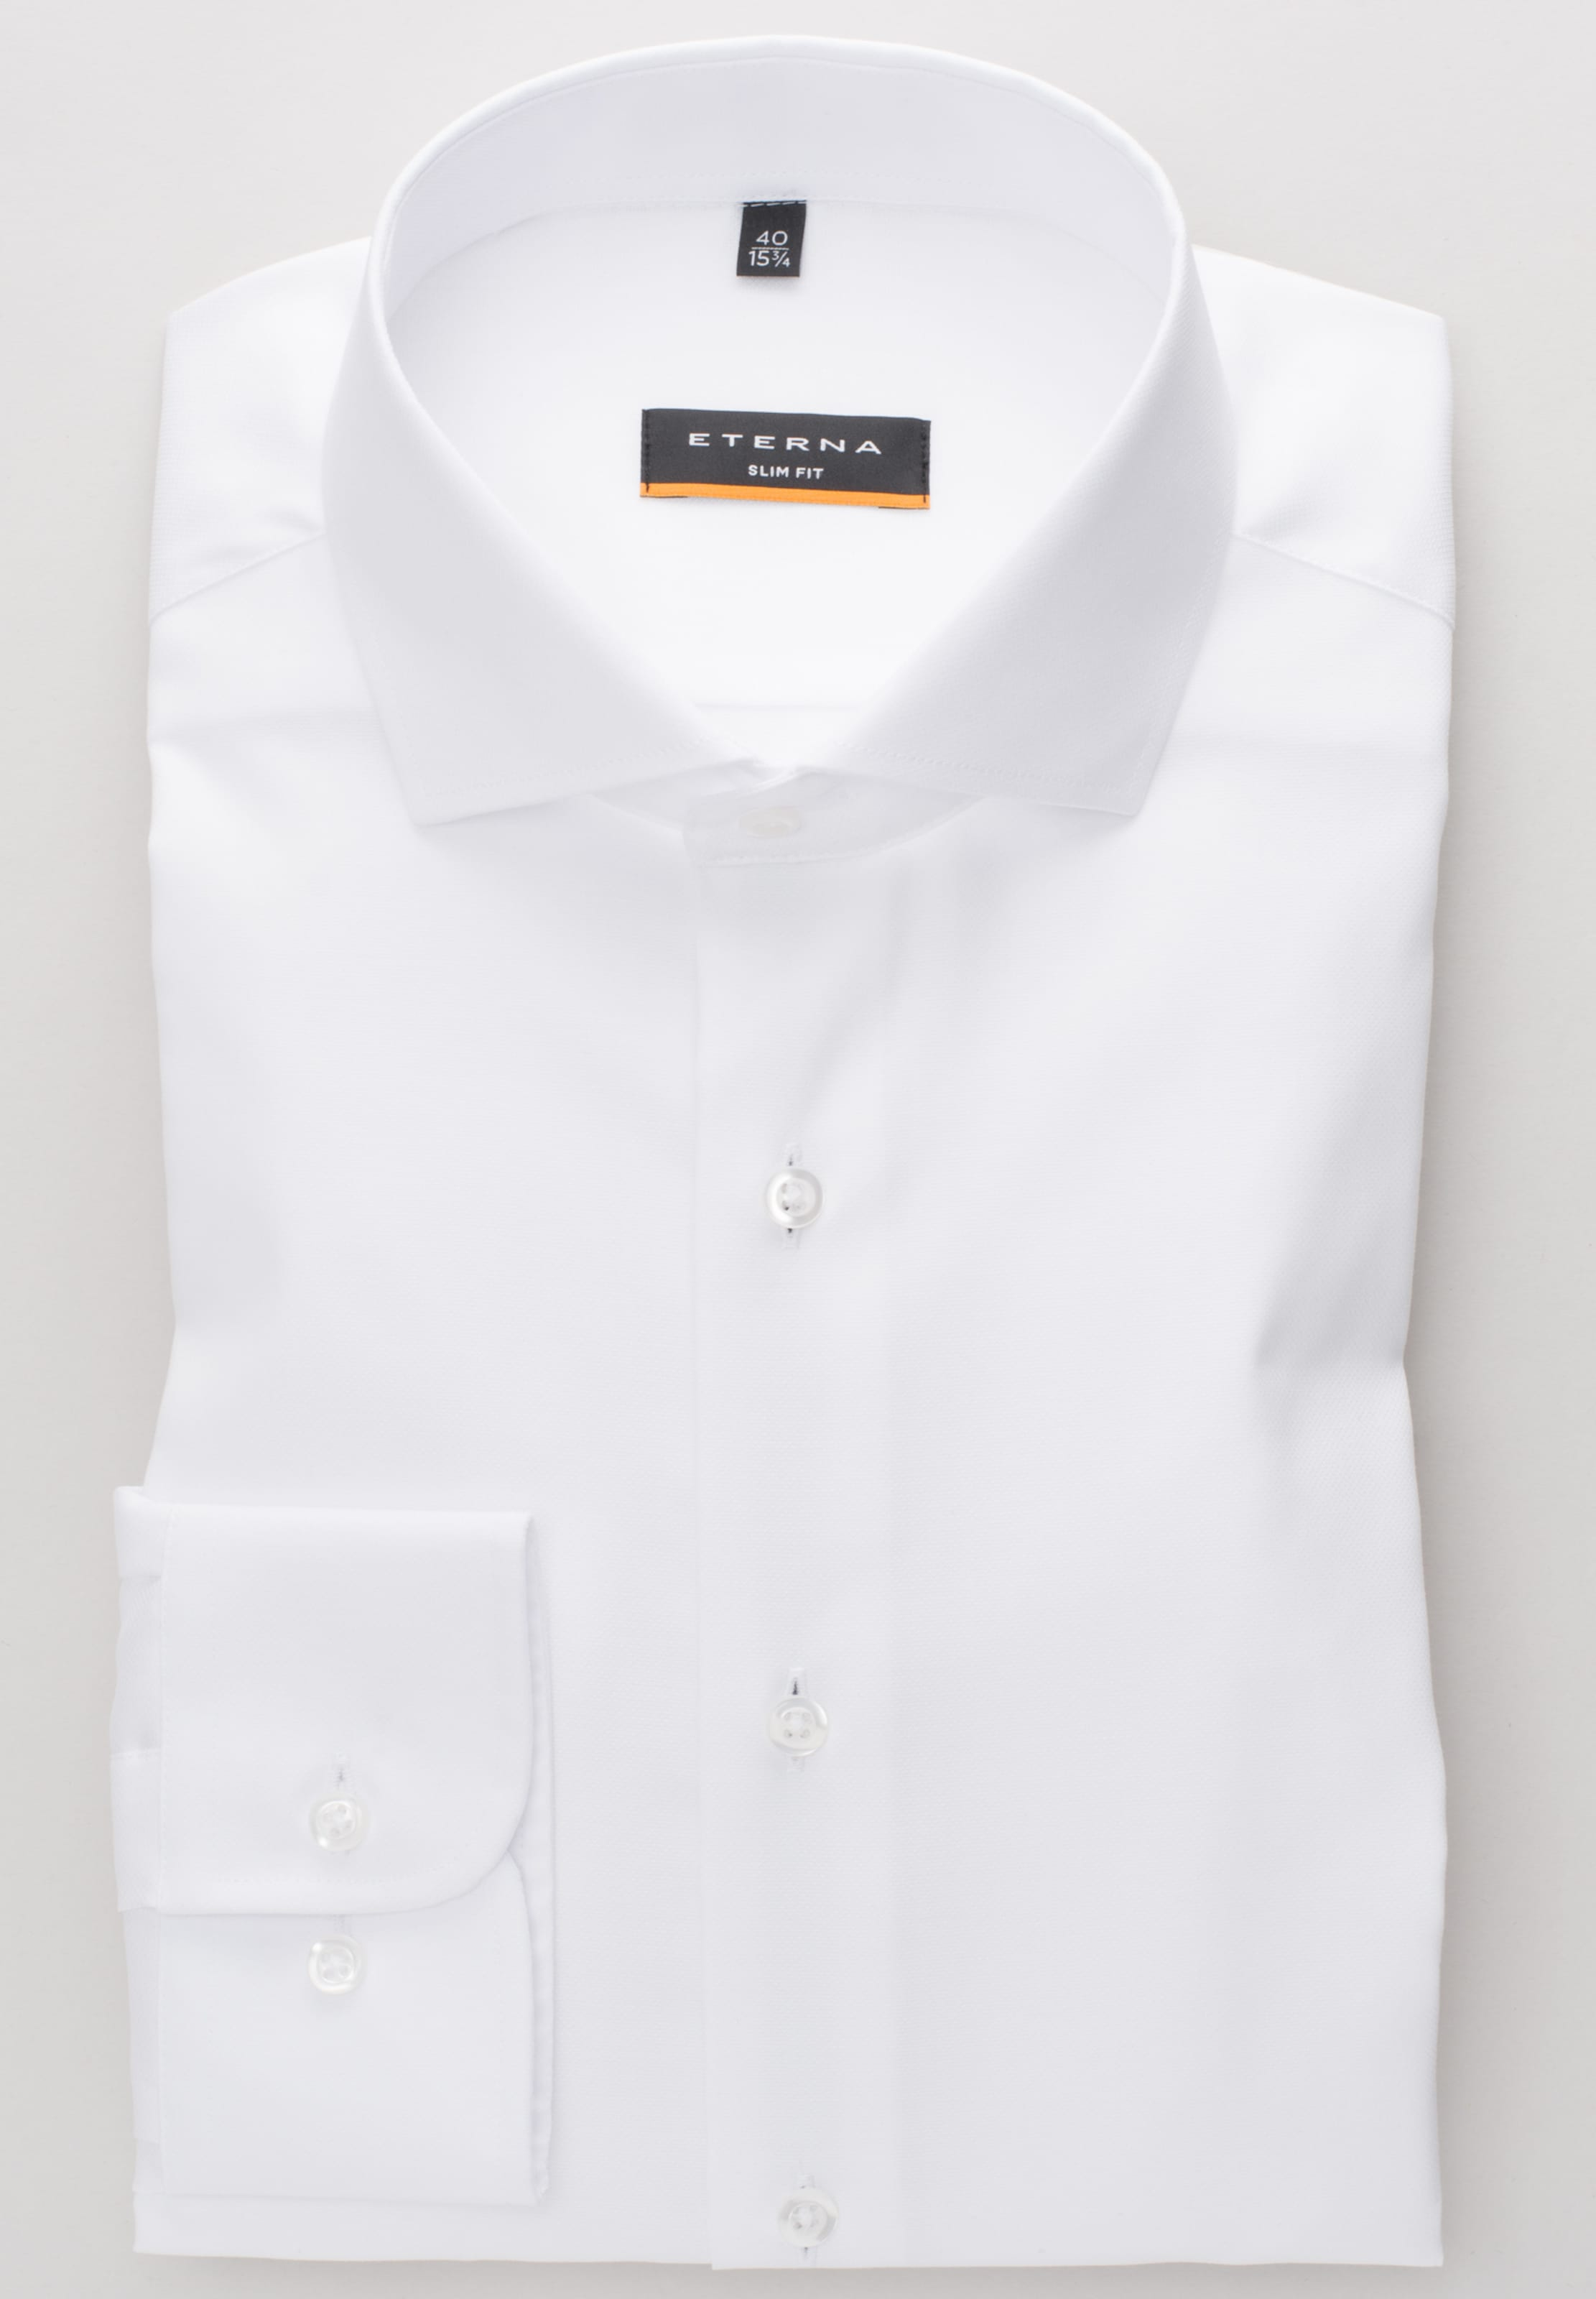 low priced 9d5fc 2116d In Weiß Eterna Eterna Hemd In Hemd CxBreWdo